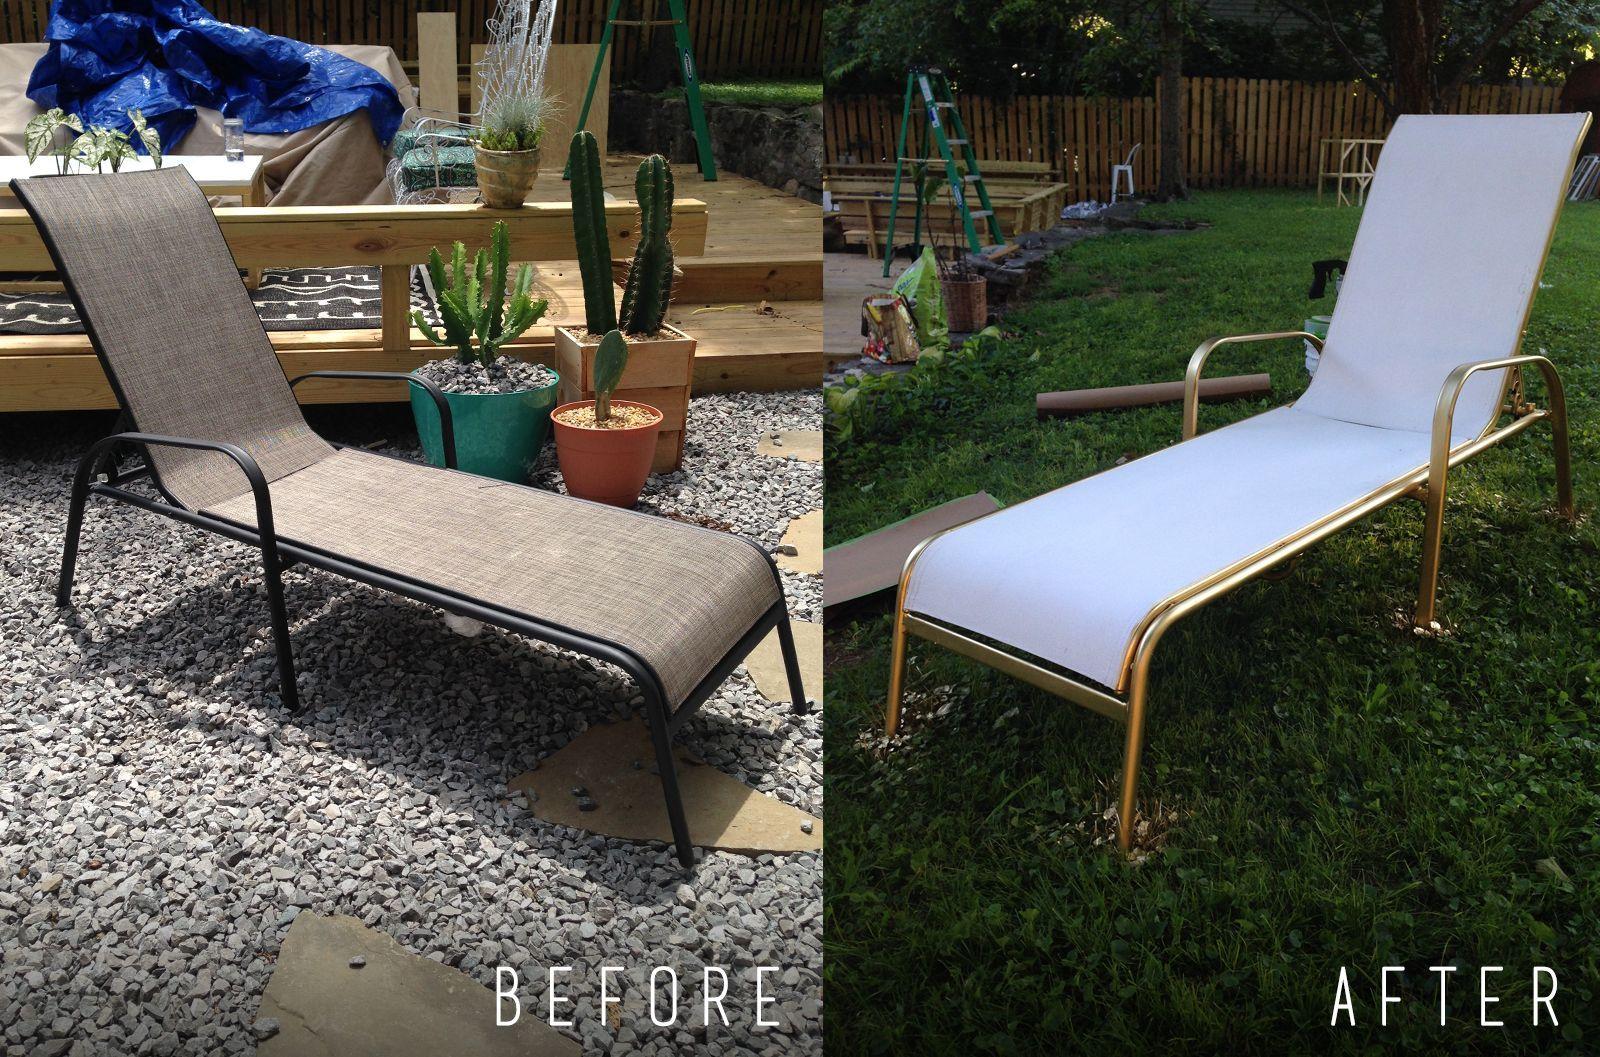 Diy Painted Lounge Chairs Pool Lounge Chairs Lounge Chair Outdoor Outdoor Lounge